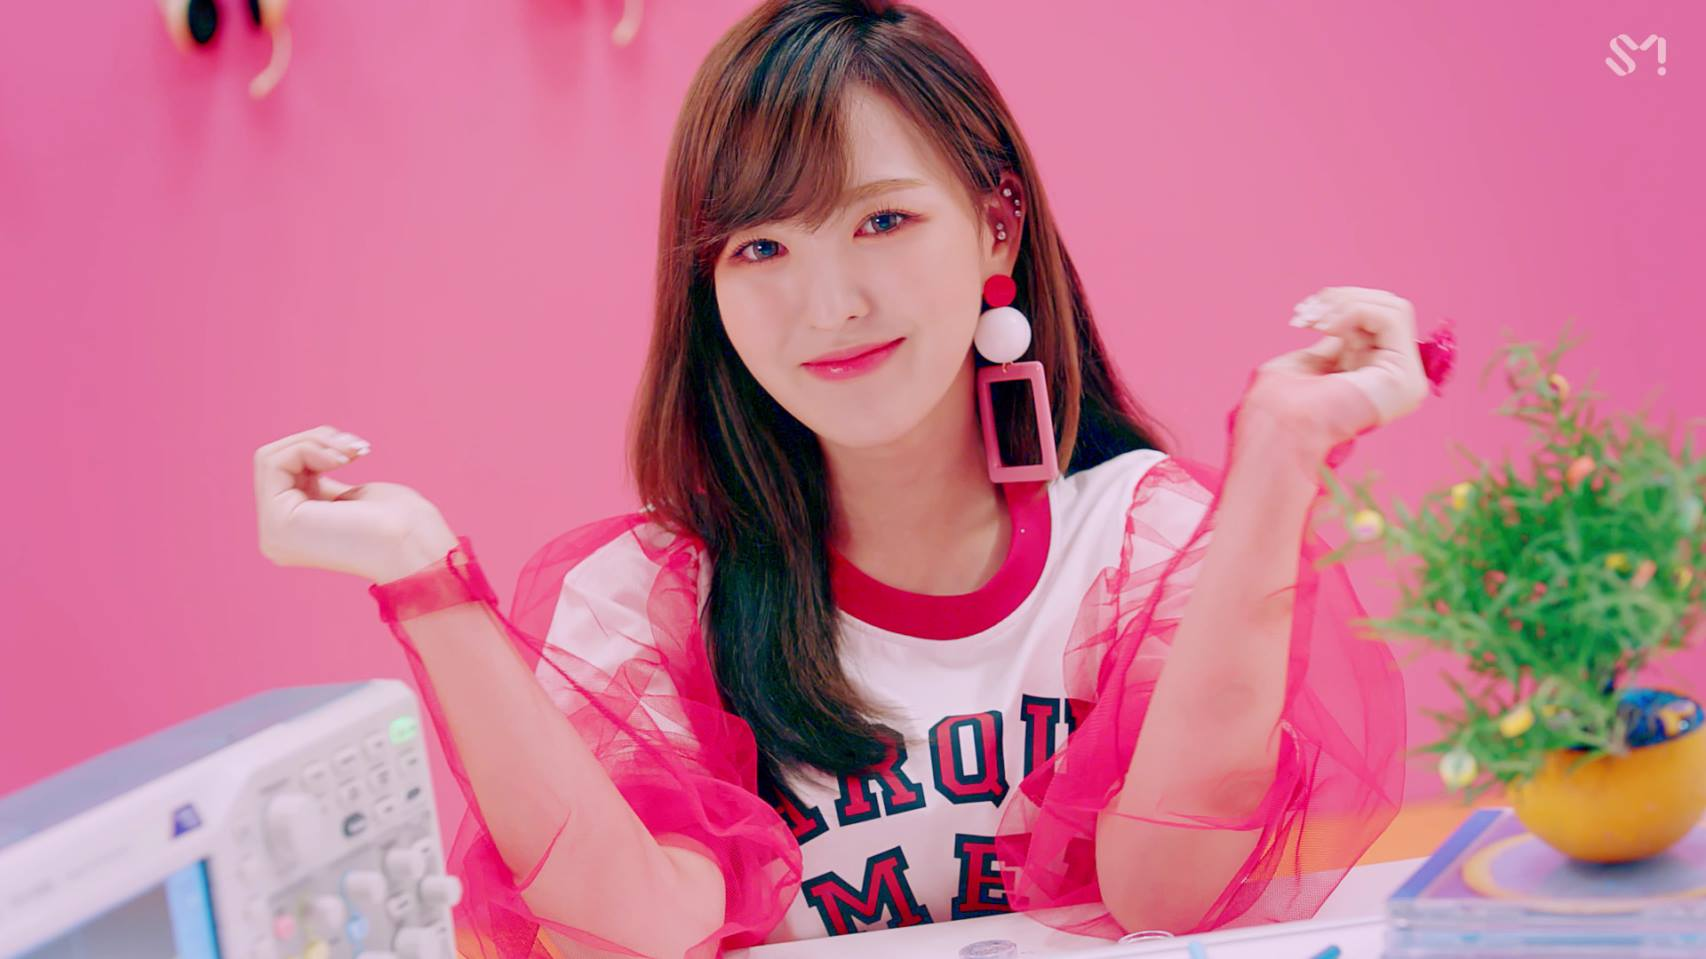 # 第十四名 : Red Velvet - WENDY ( 349票 )